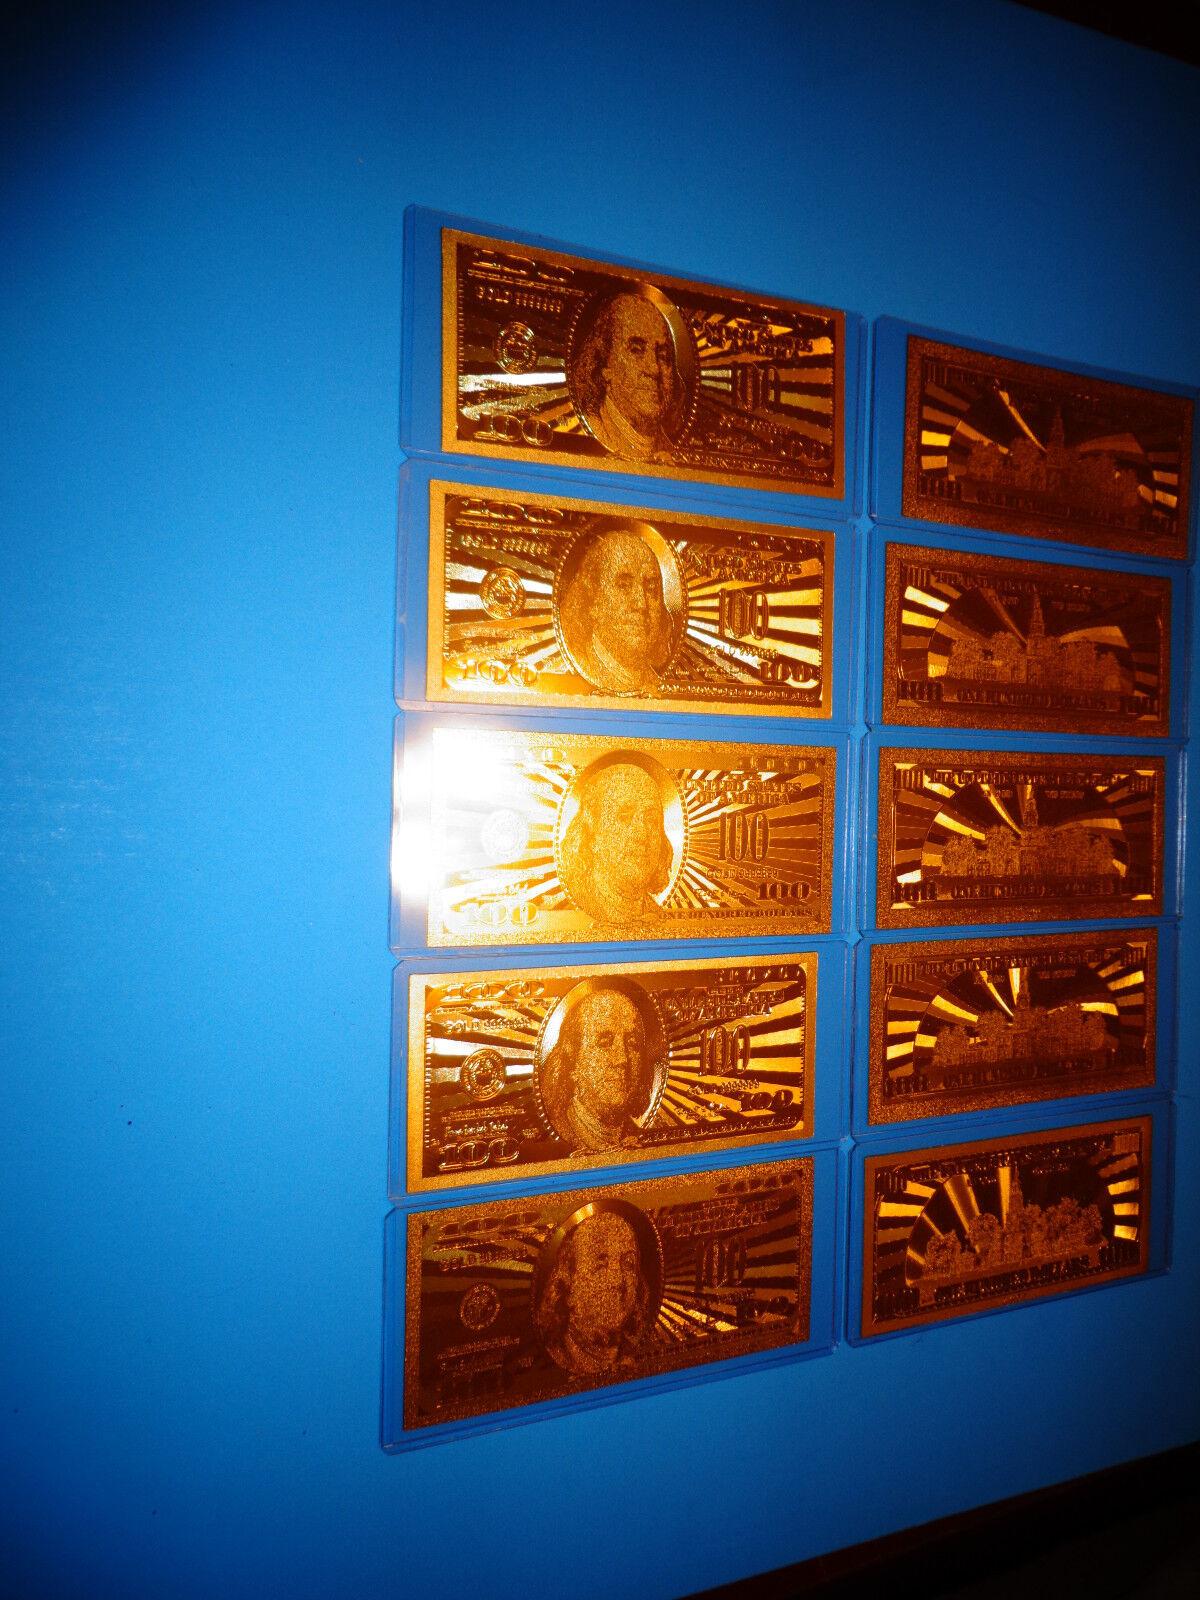 24 KARAT 99.9/% GOLD U.S.A $ 1 DOLLAR BILL* 2009*COMES IN RIGID PVC BILL HOLDER